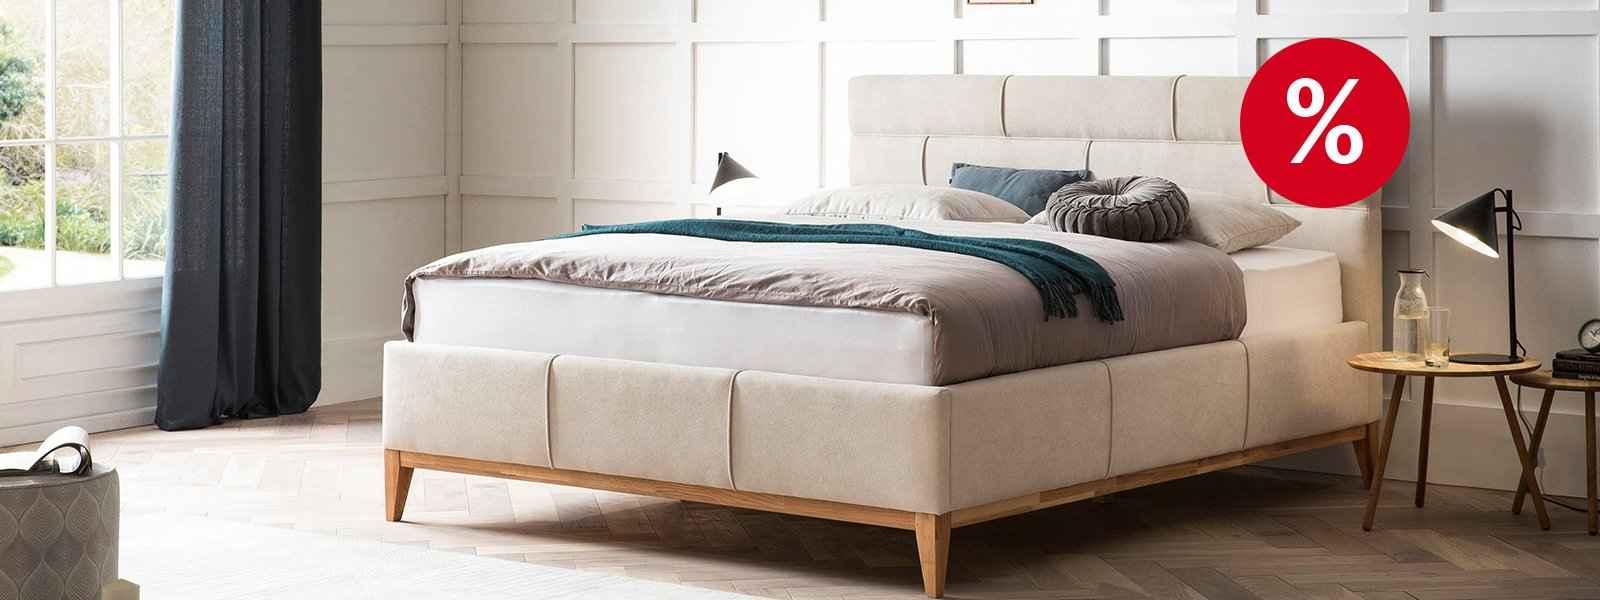 Günstige Betten